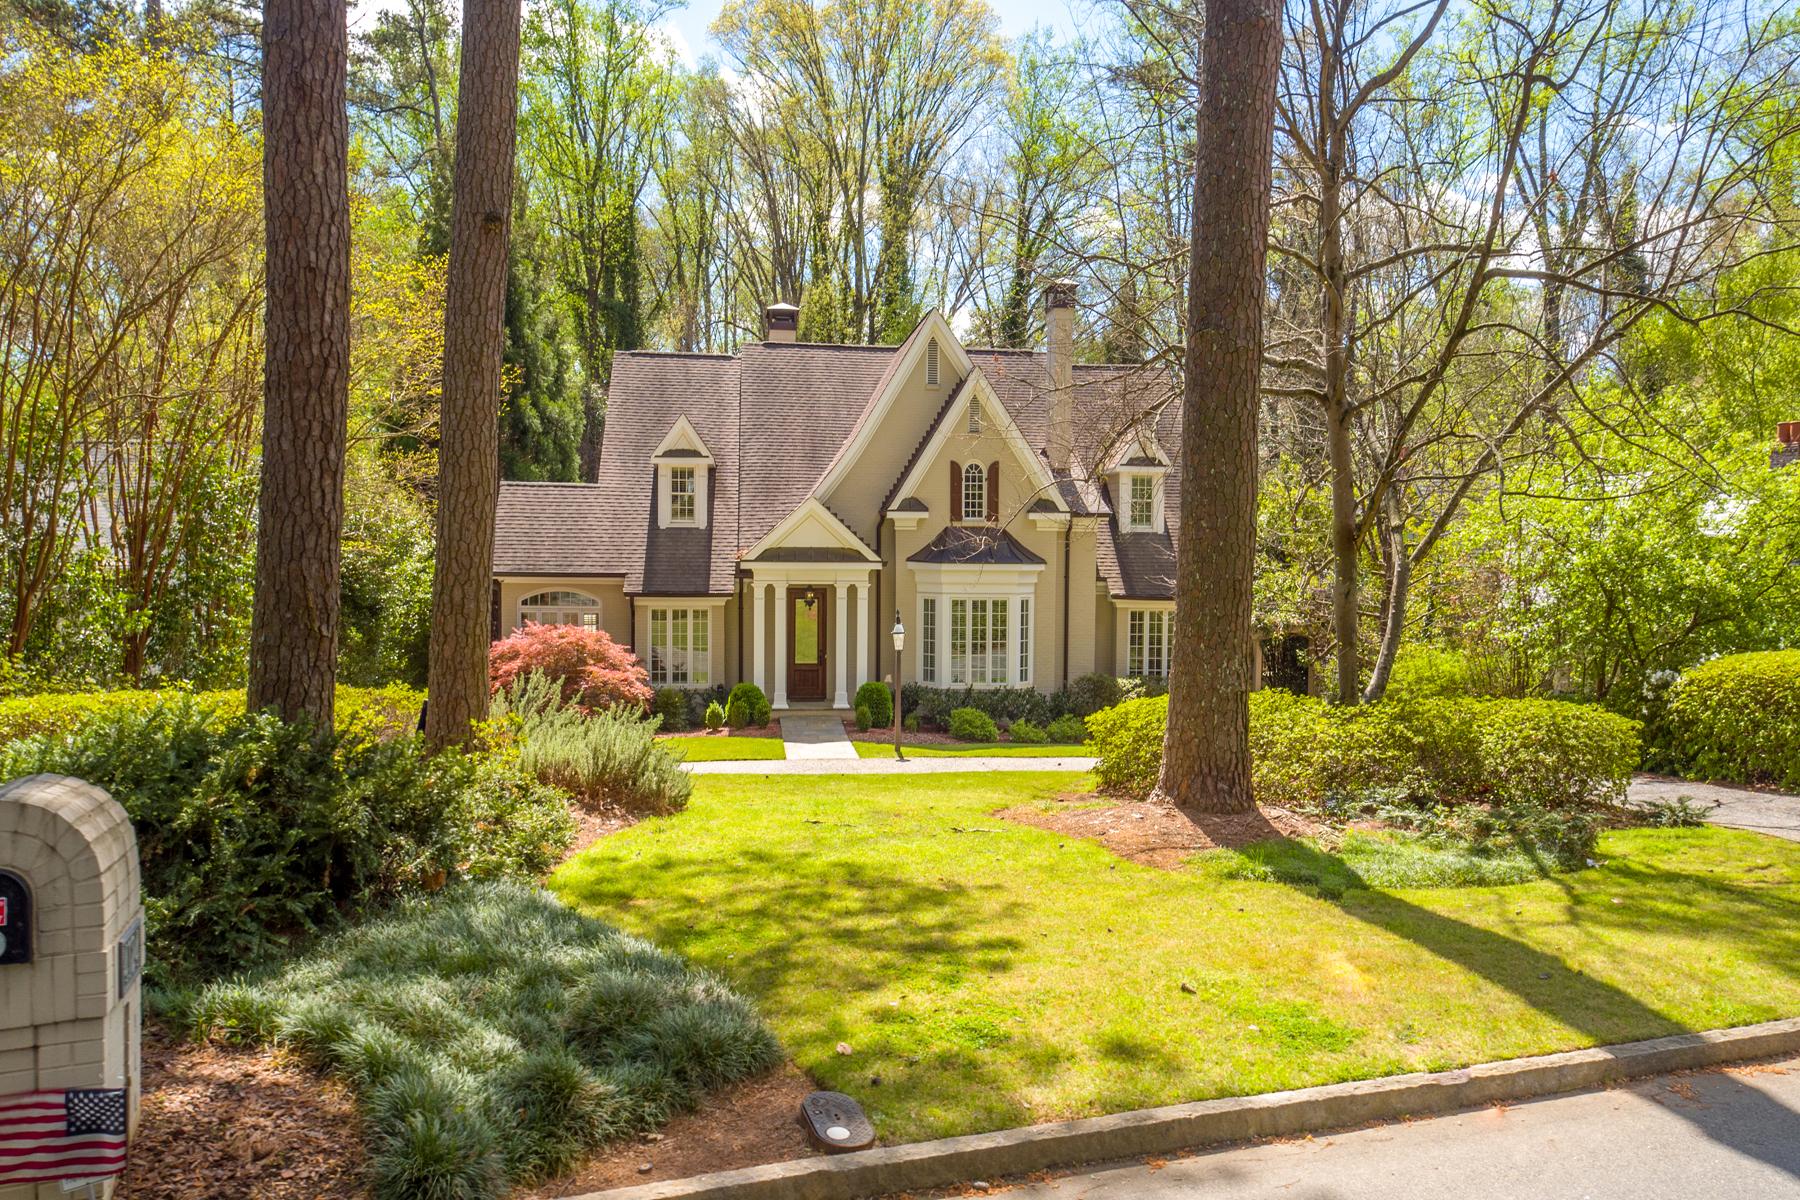 獨棟家庭住宅 為 出售 在 Gorgeous Home In Ideal Brookhaven Location 4124 Club Drive Brookhaven, Atlanta, 喬治亞州, 30319 美國